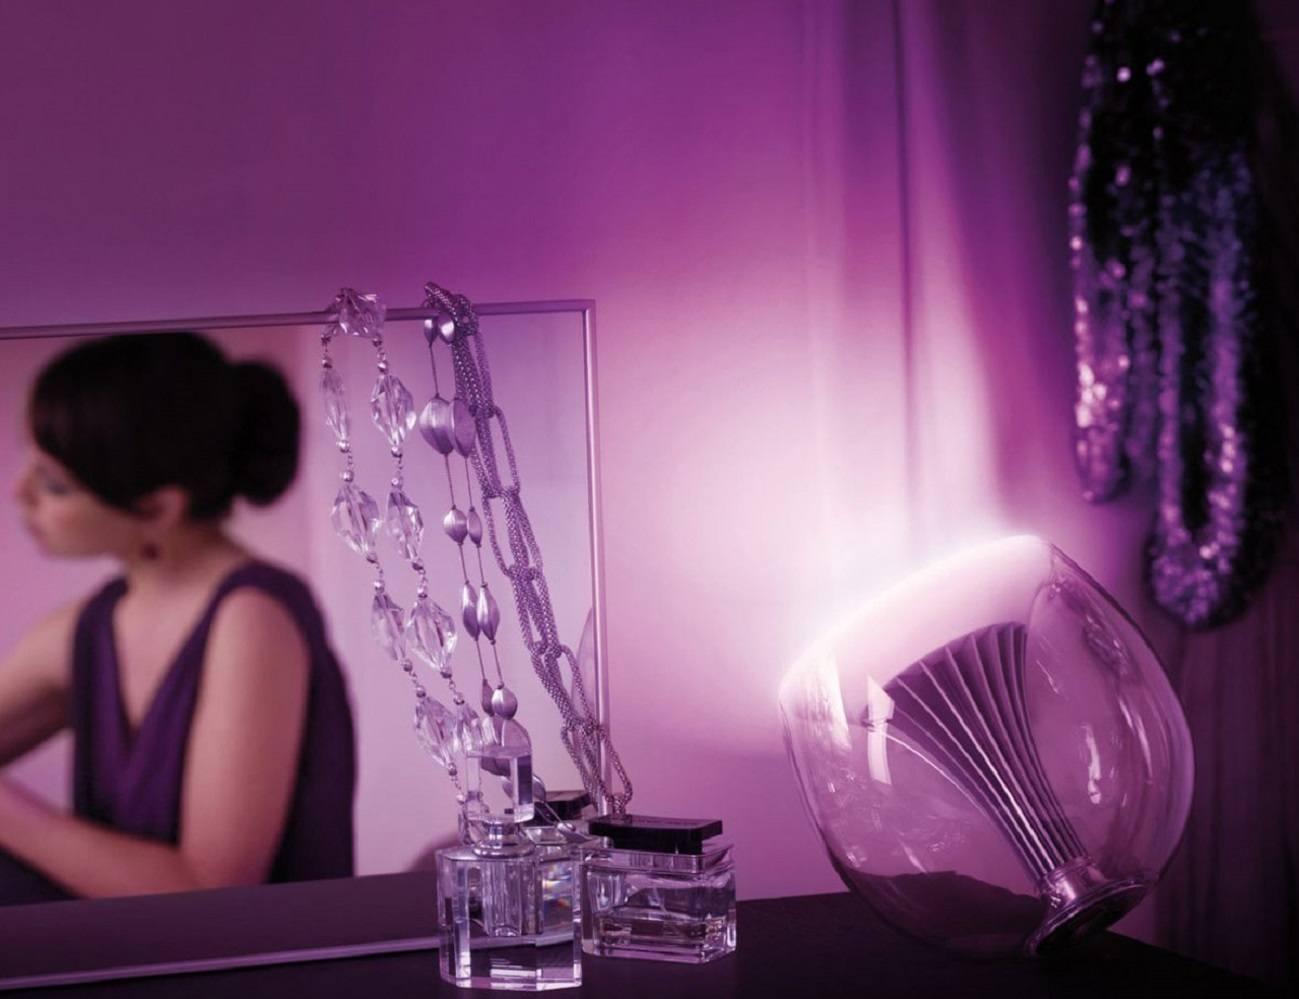 Philips LivingColors Translucent Changing LED Lamp